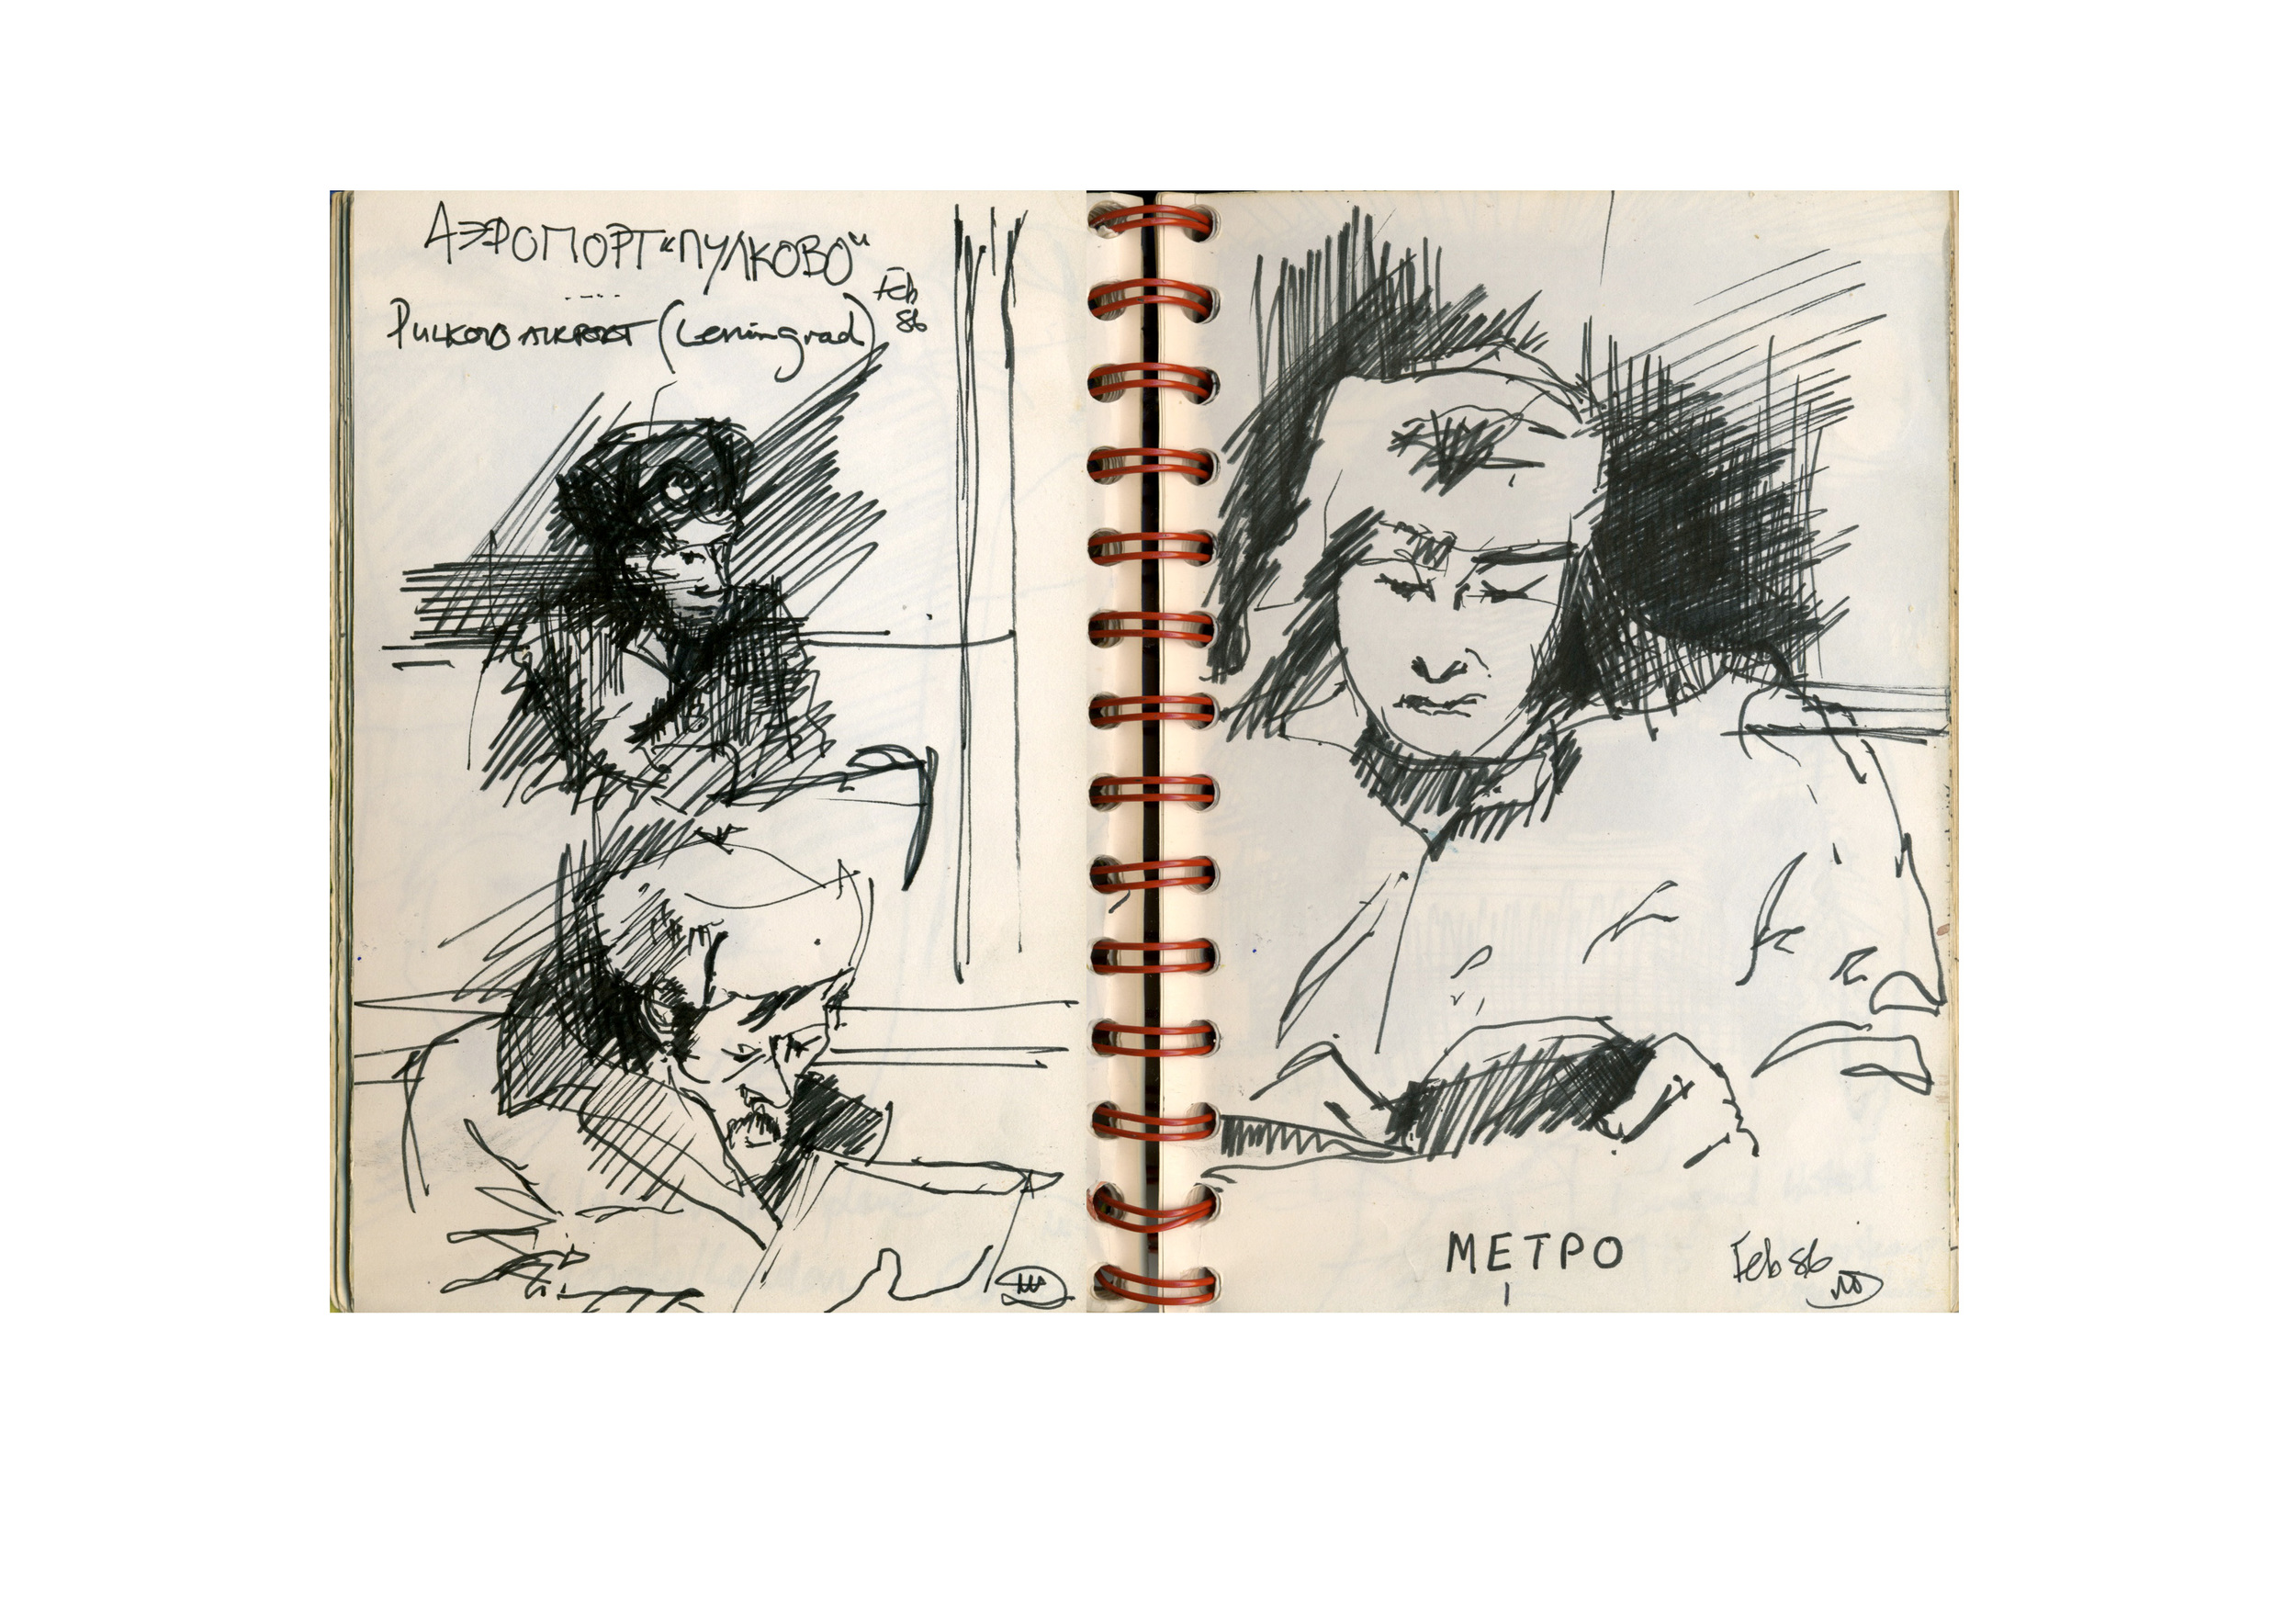 The Metro - Moscow